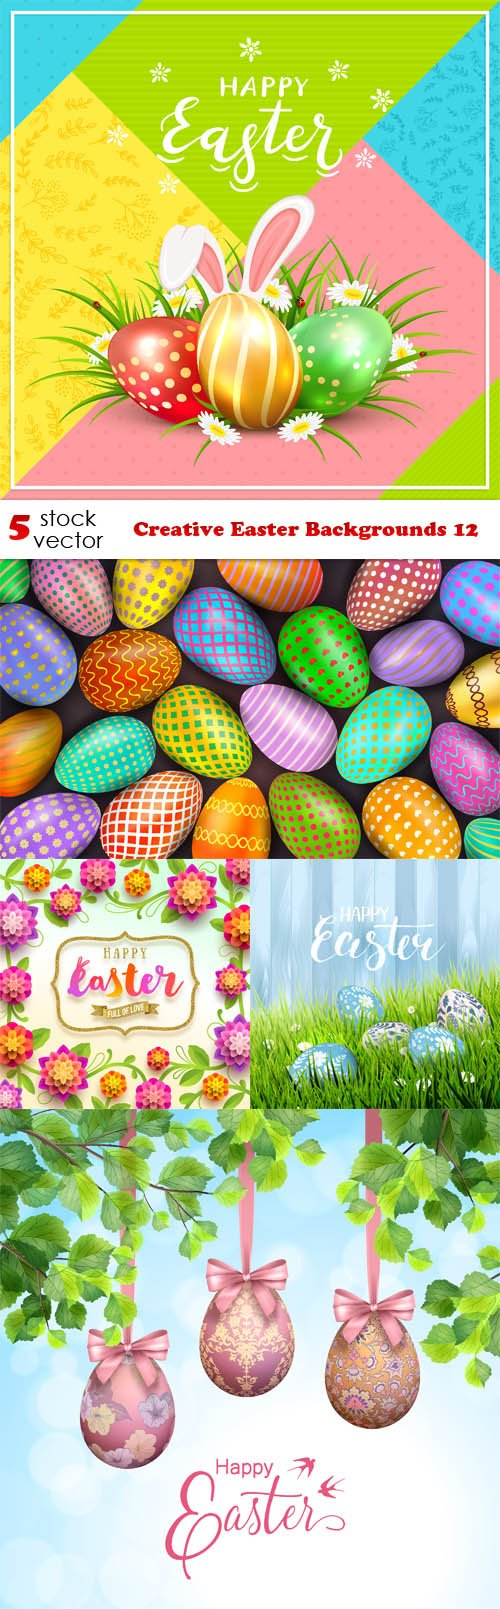 Vectors - Creative Easter Backgrounds 12